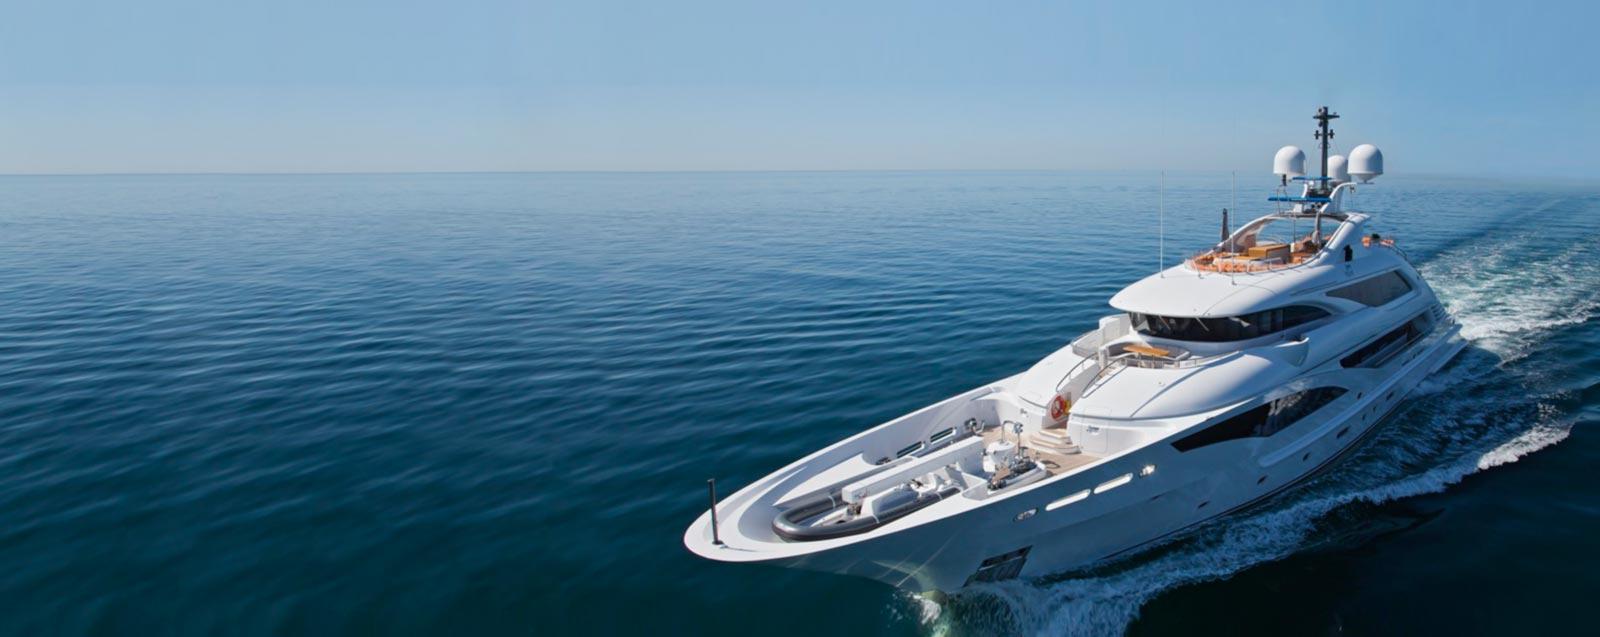 Yacht & Marine Services